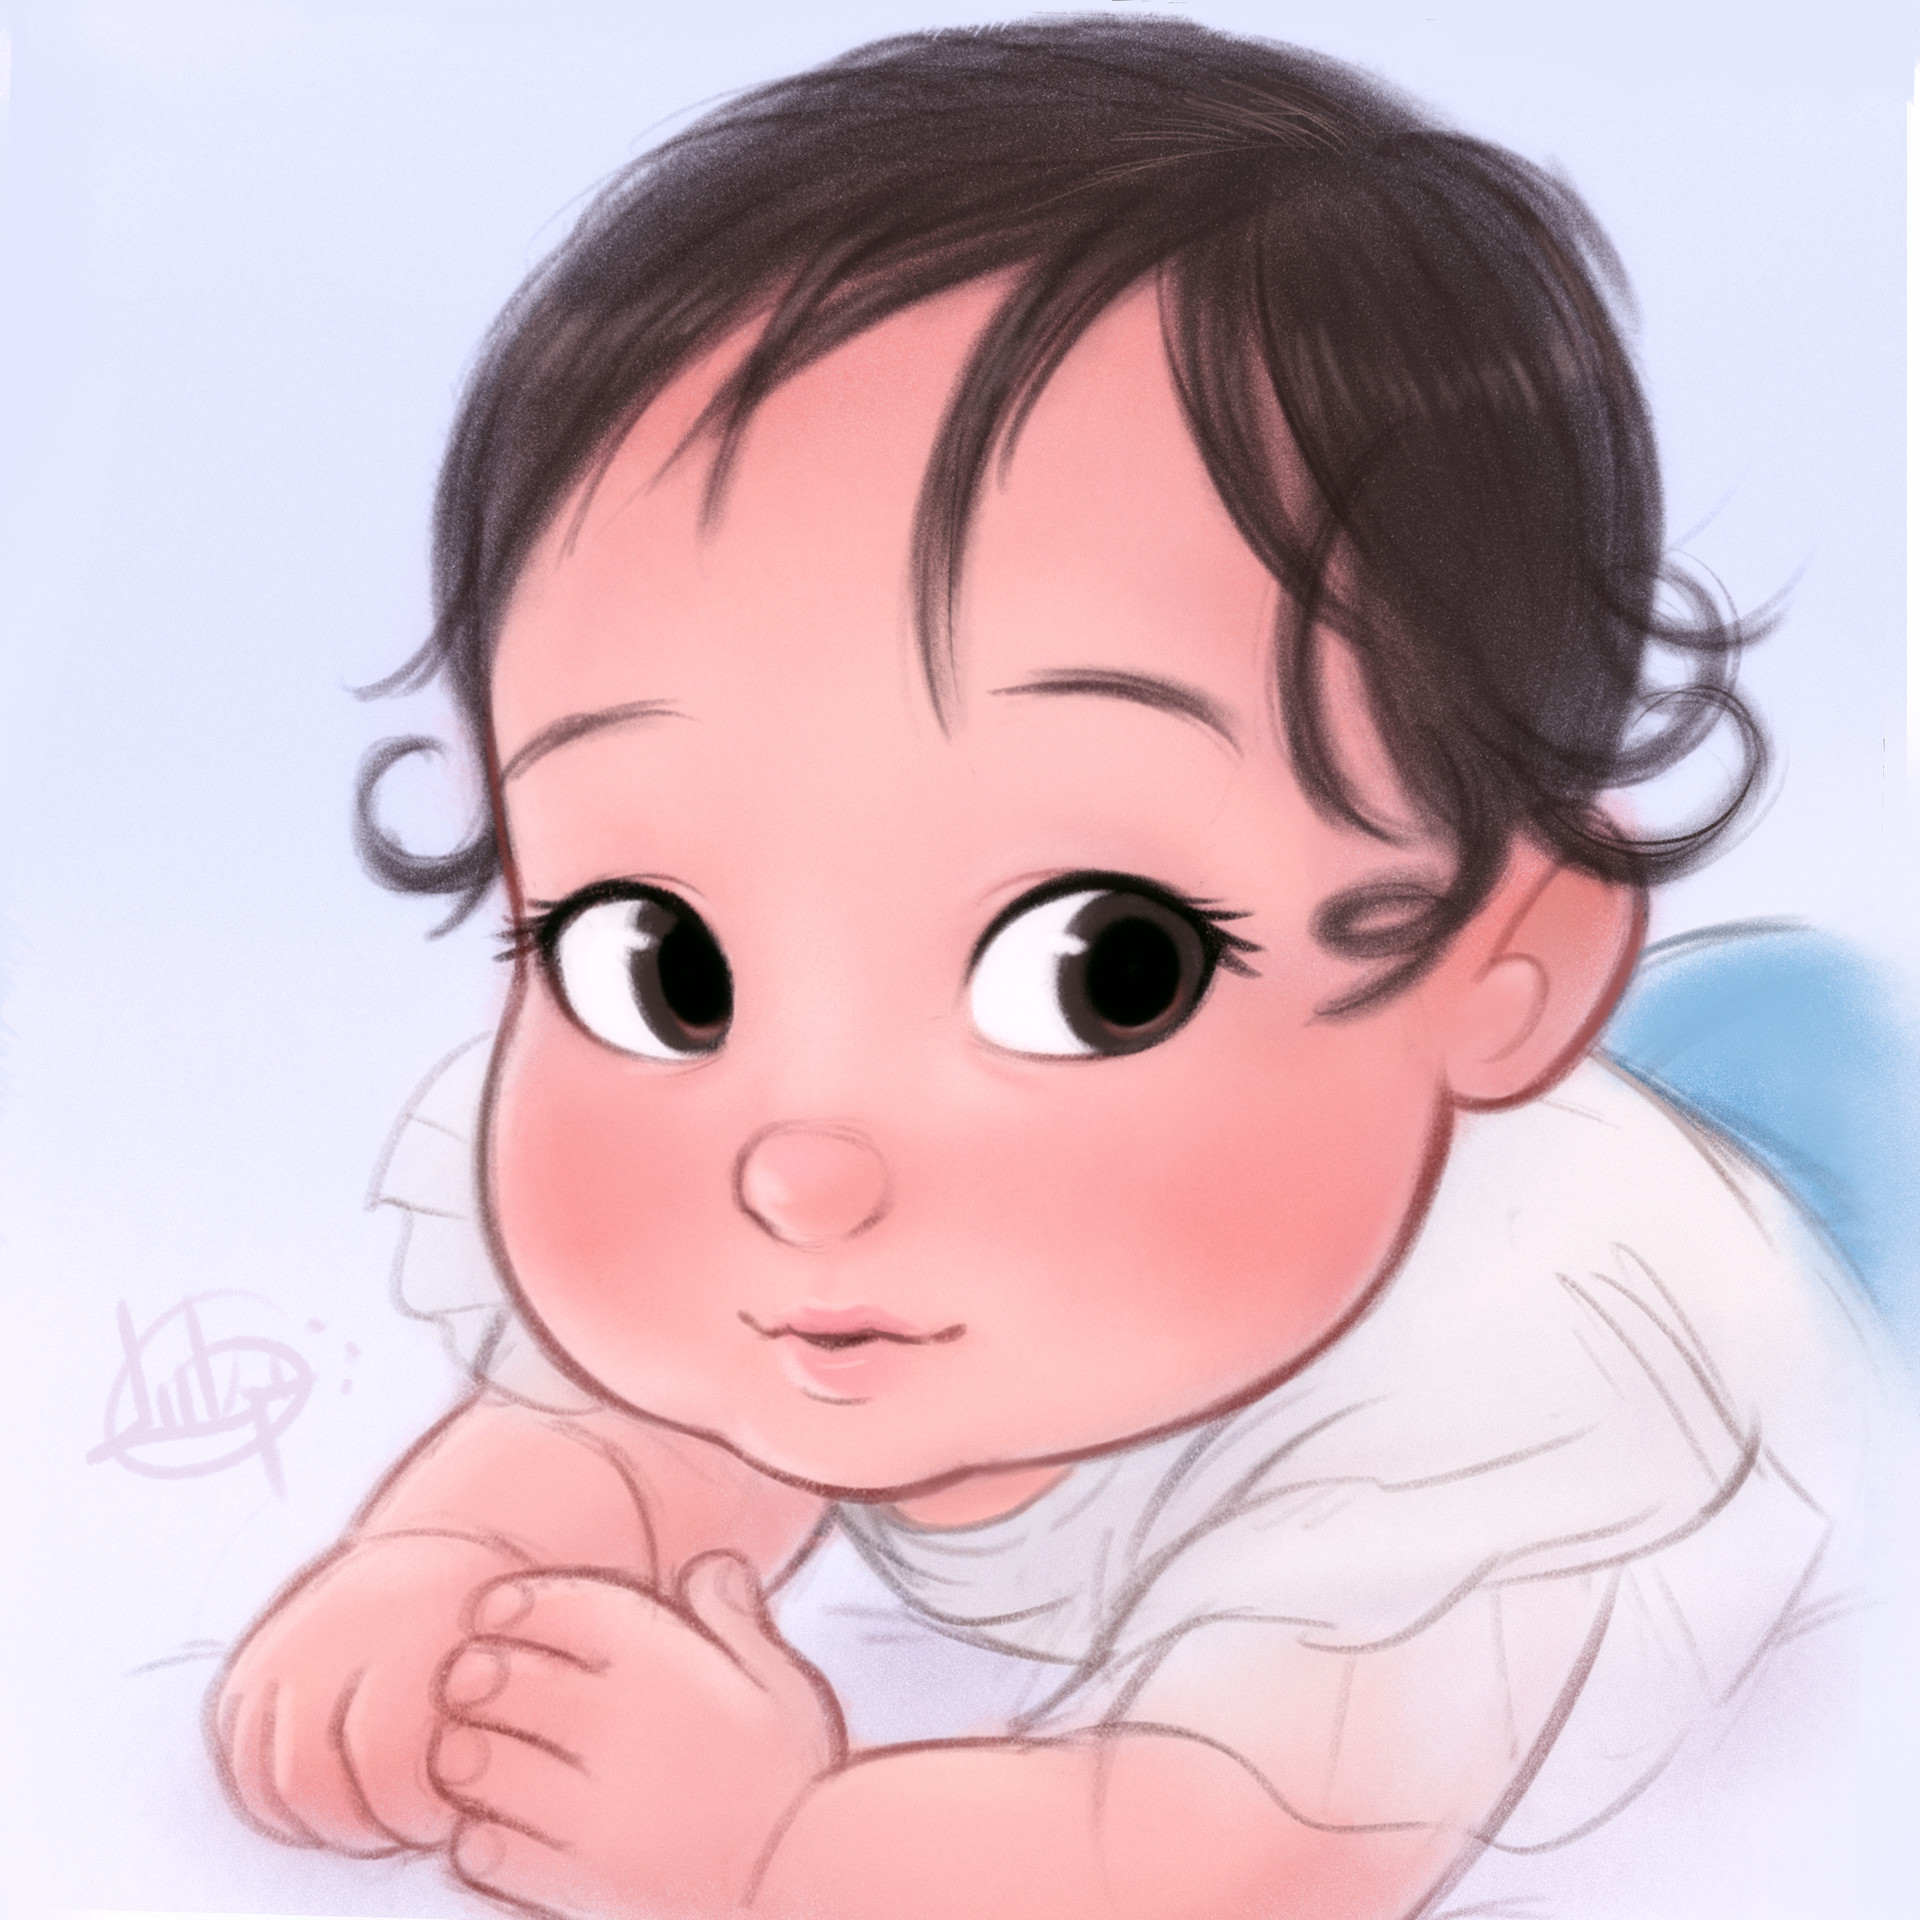 Luigi lucarelli reina 7 months old